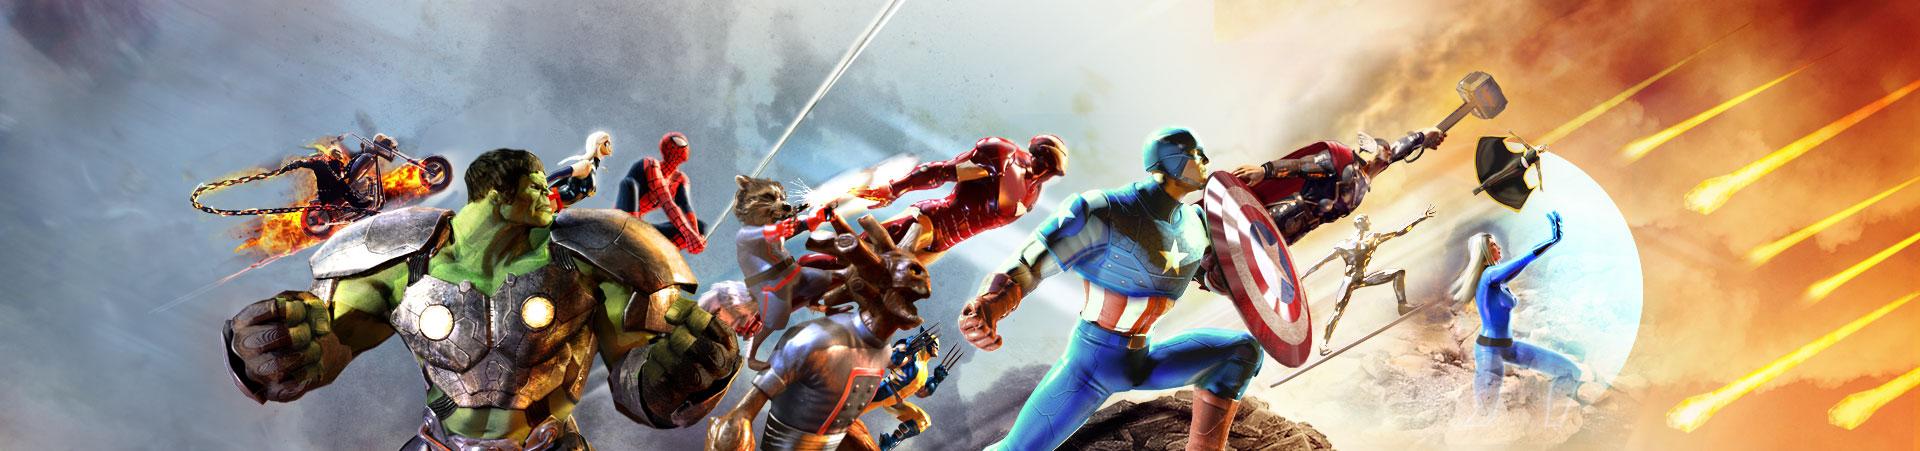 Preview (GamesCom 2014) – Marvel Heroes